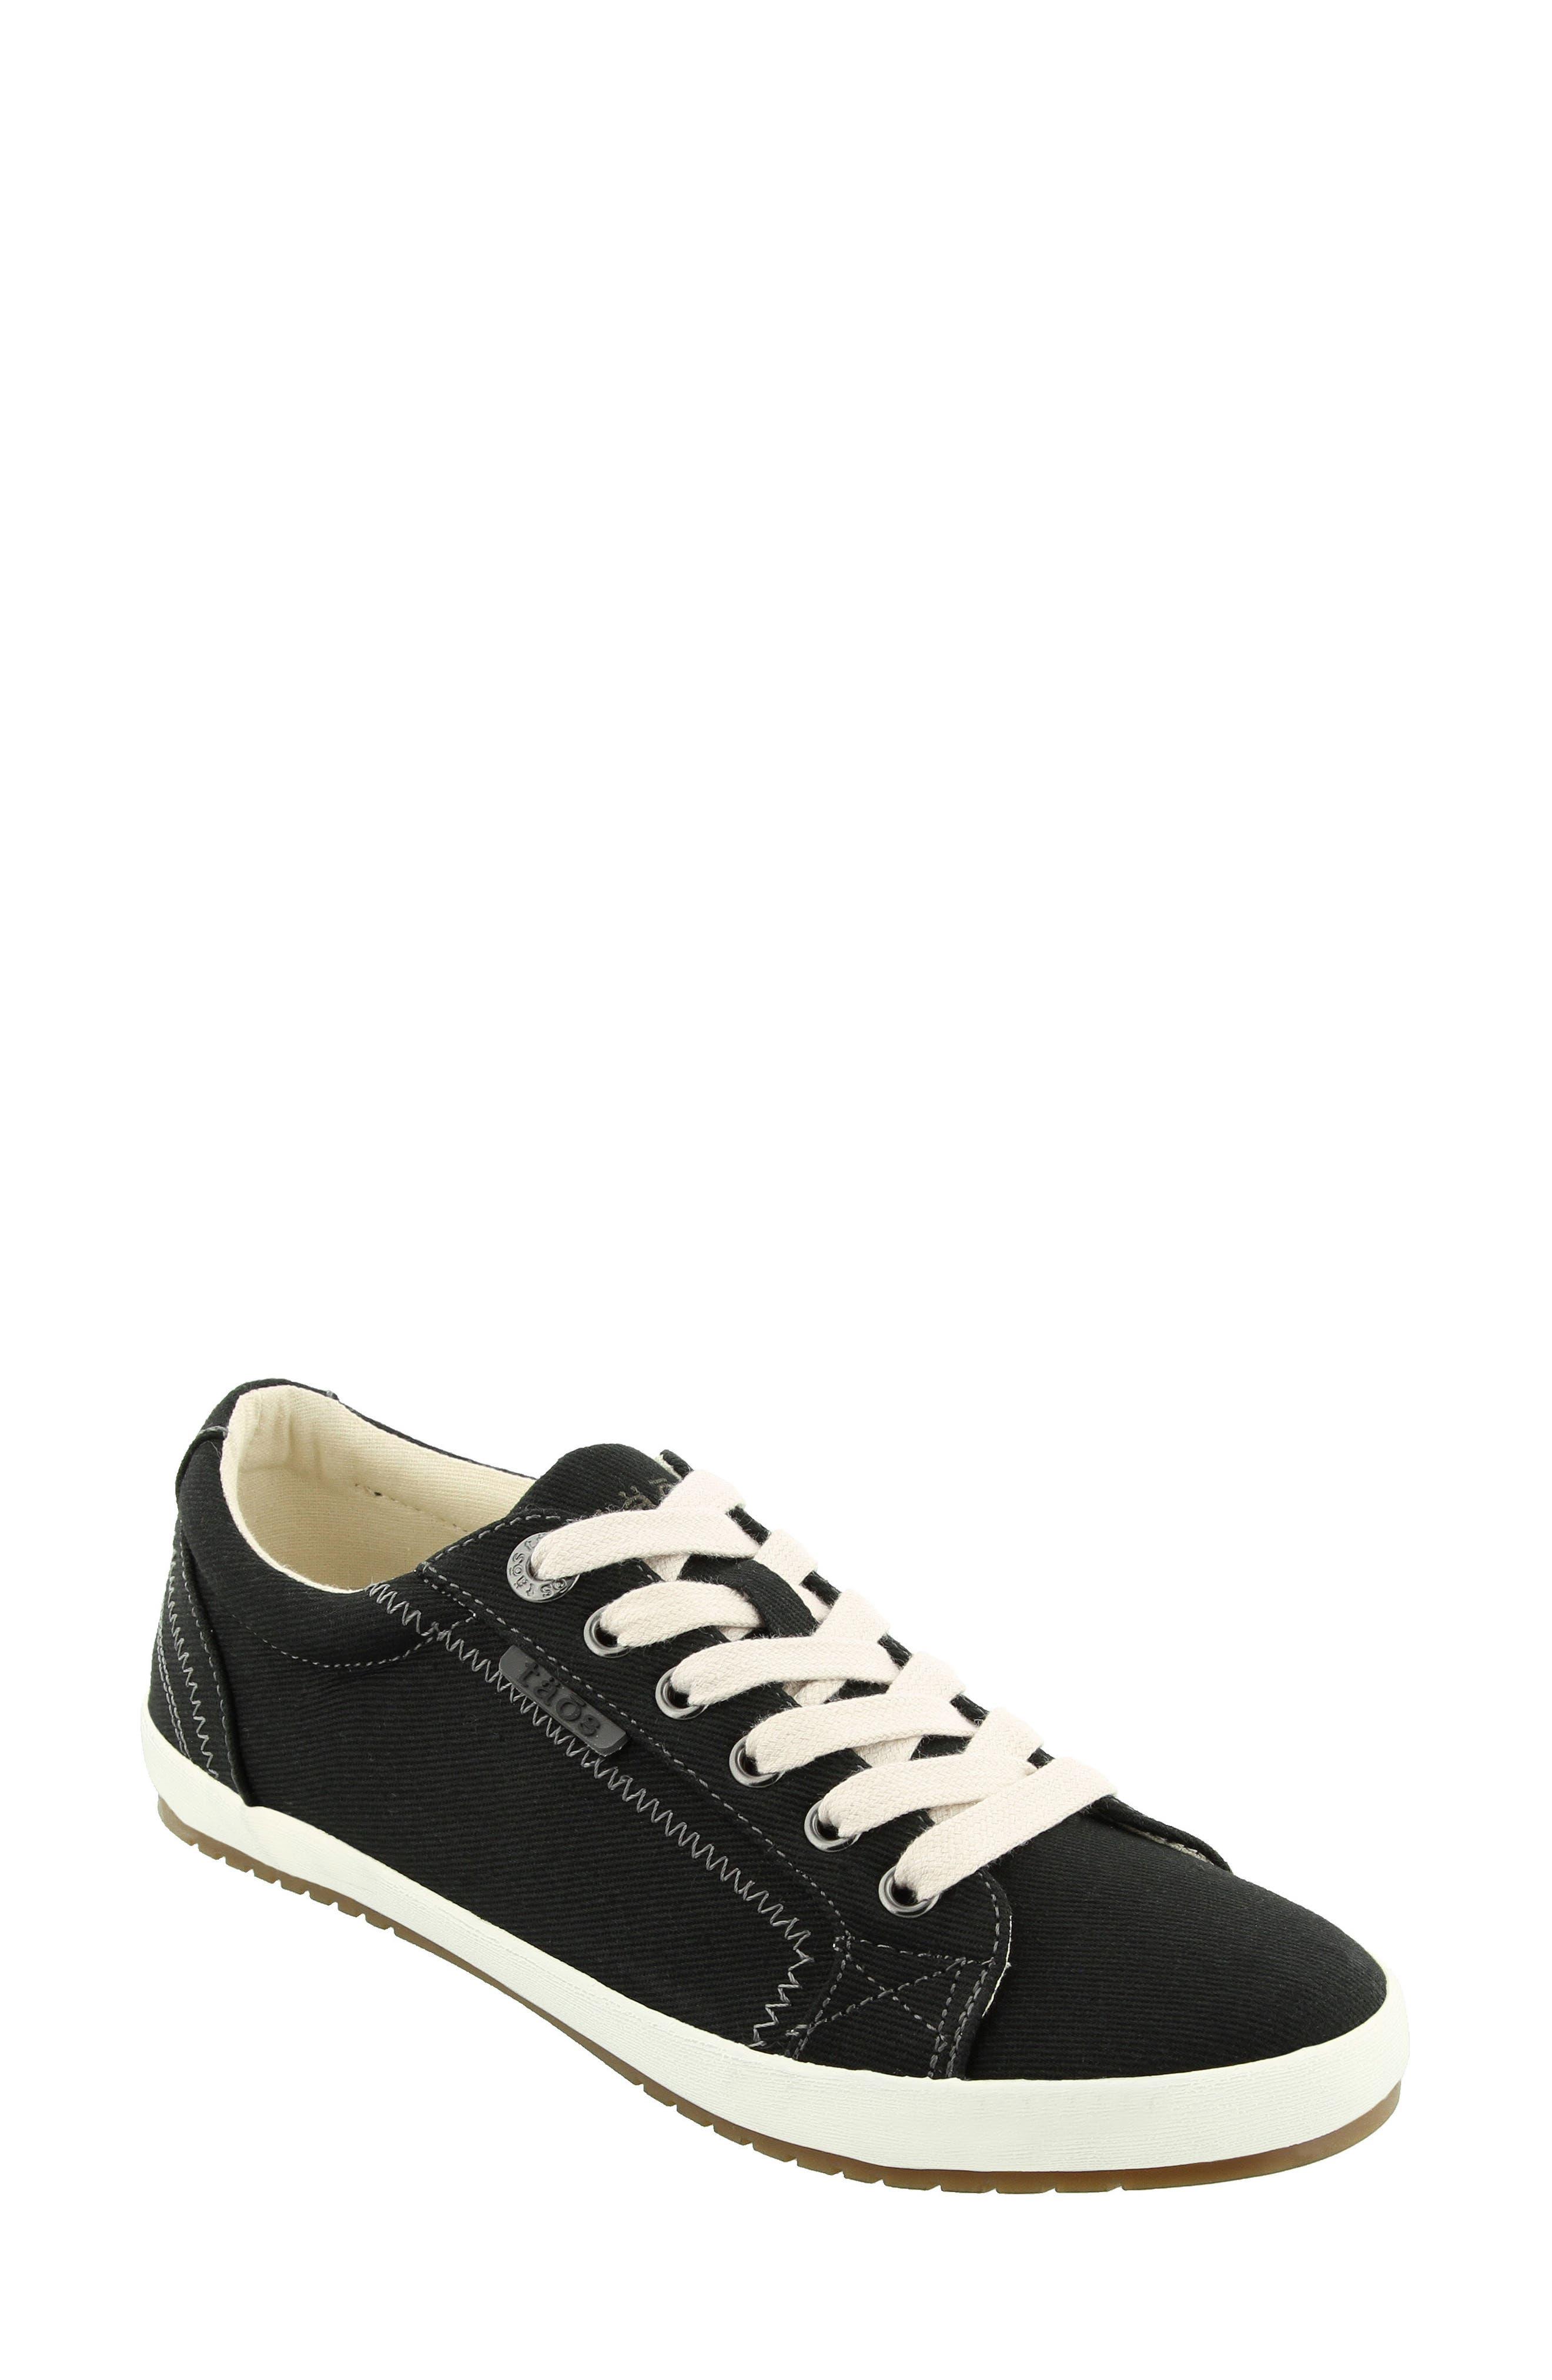 'Star' Sneaker,                             Main thumbnail 1, color,                             BLACK CANVAS